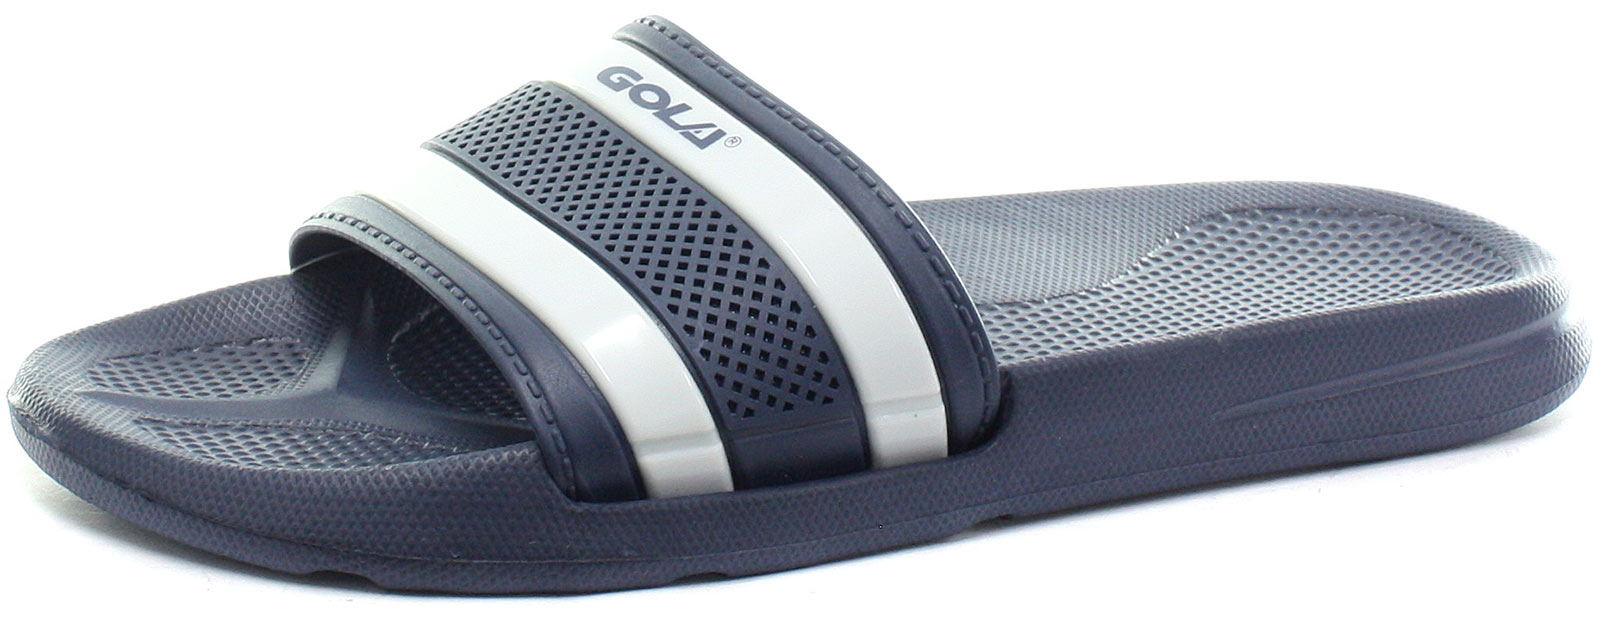 0aca387015662 New Gola Nevada Womens Beach Pool Shower Sport Slide Sandals ALL SIZES